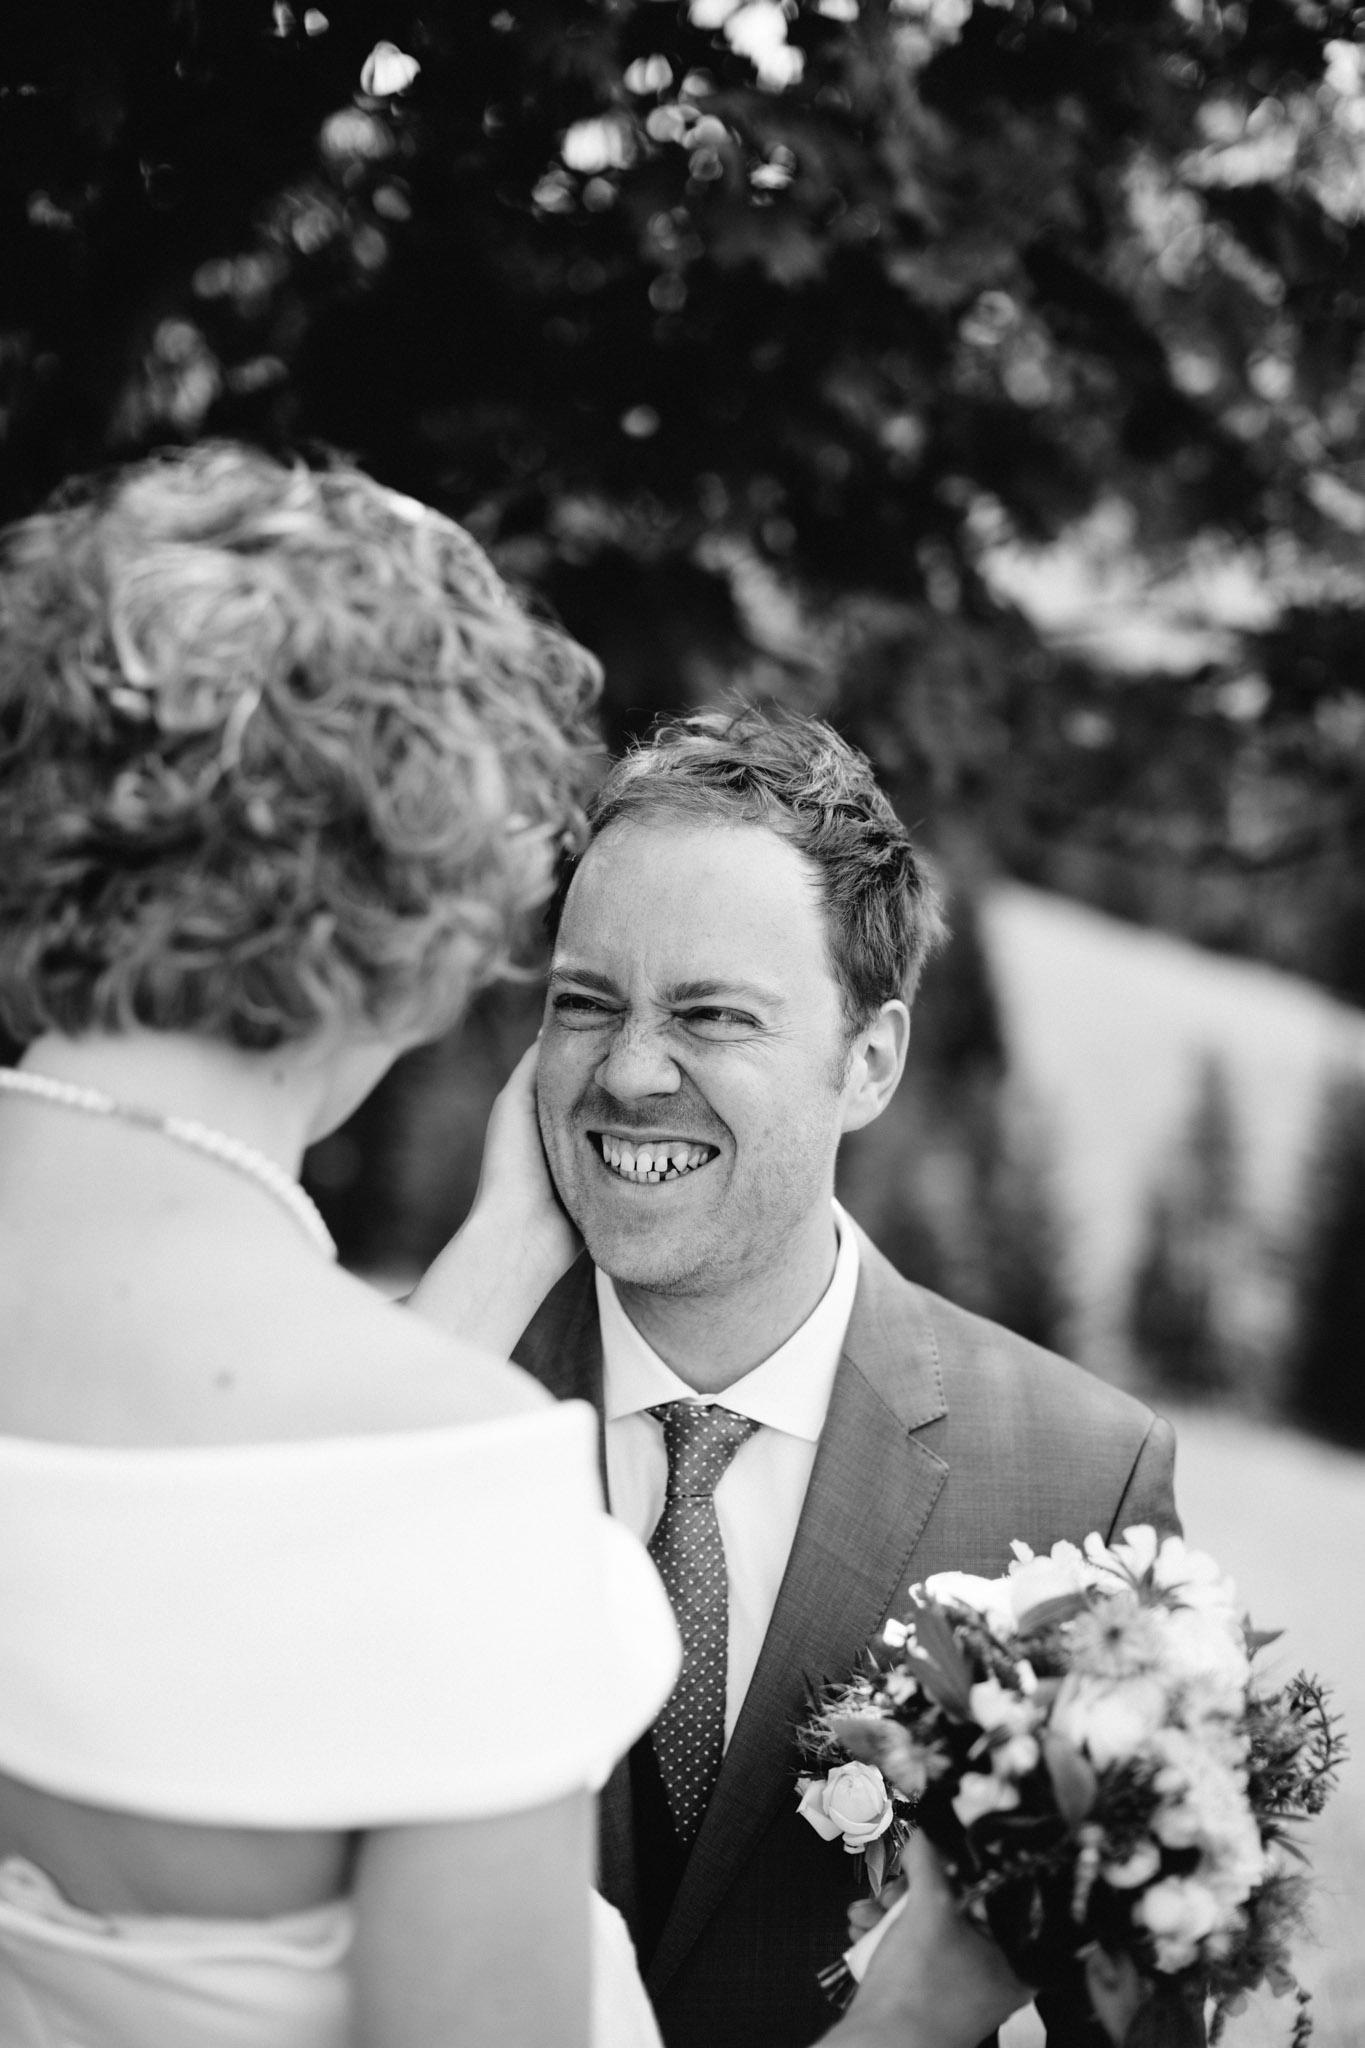 Lenl-Simmental-Buehlerhof-Pia-Anna-Christian-Wedding-Photography-EK-37.jpg